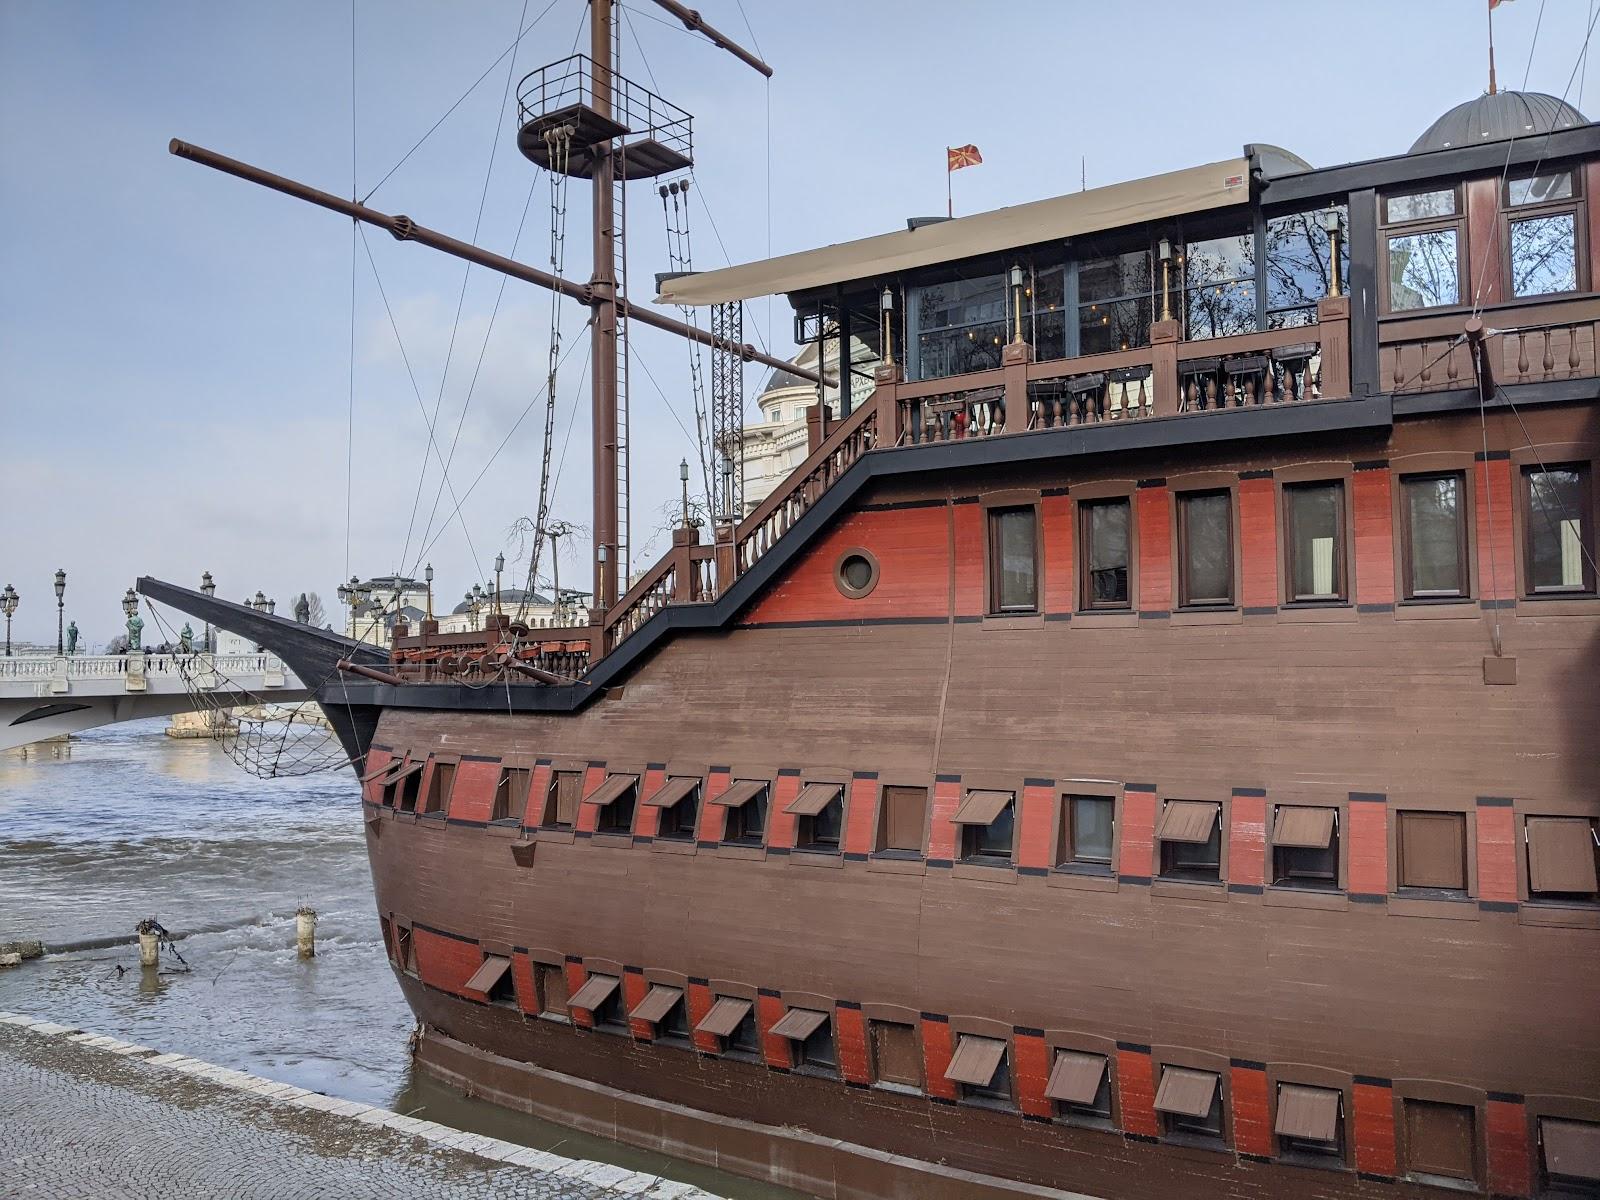 Senigallia Boat Hotel